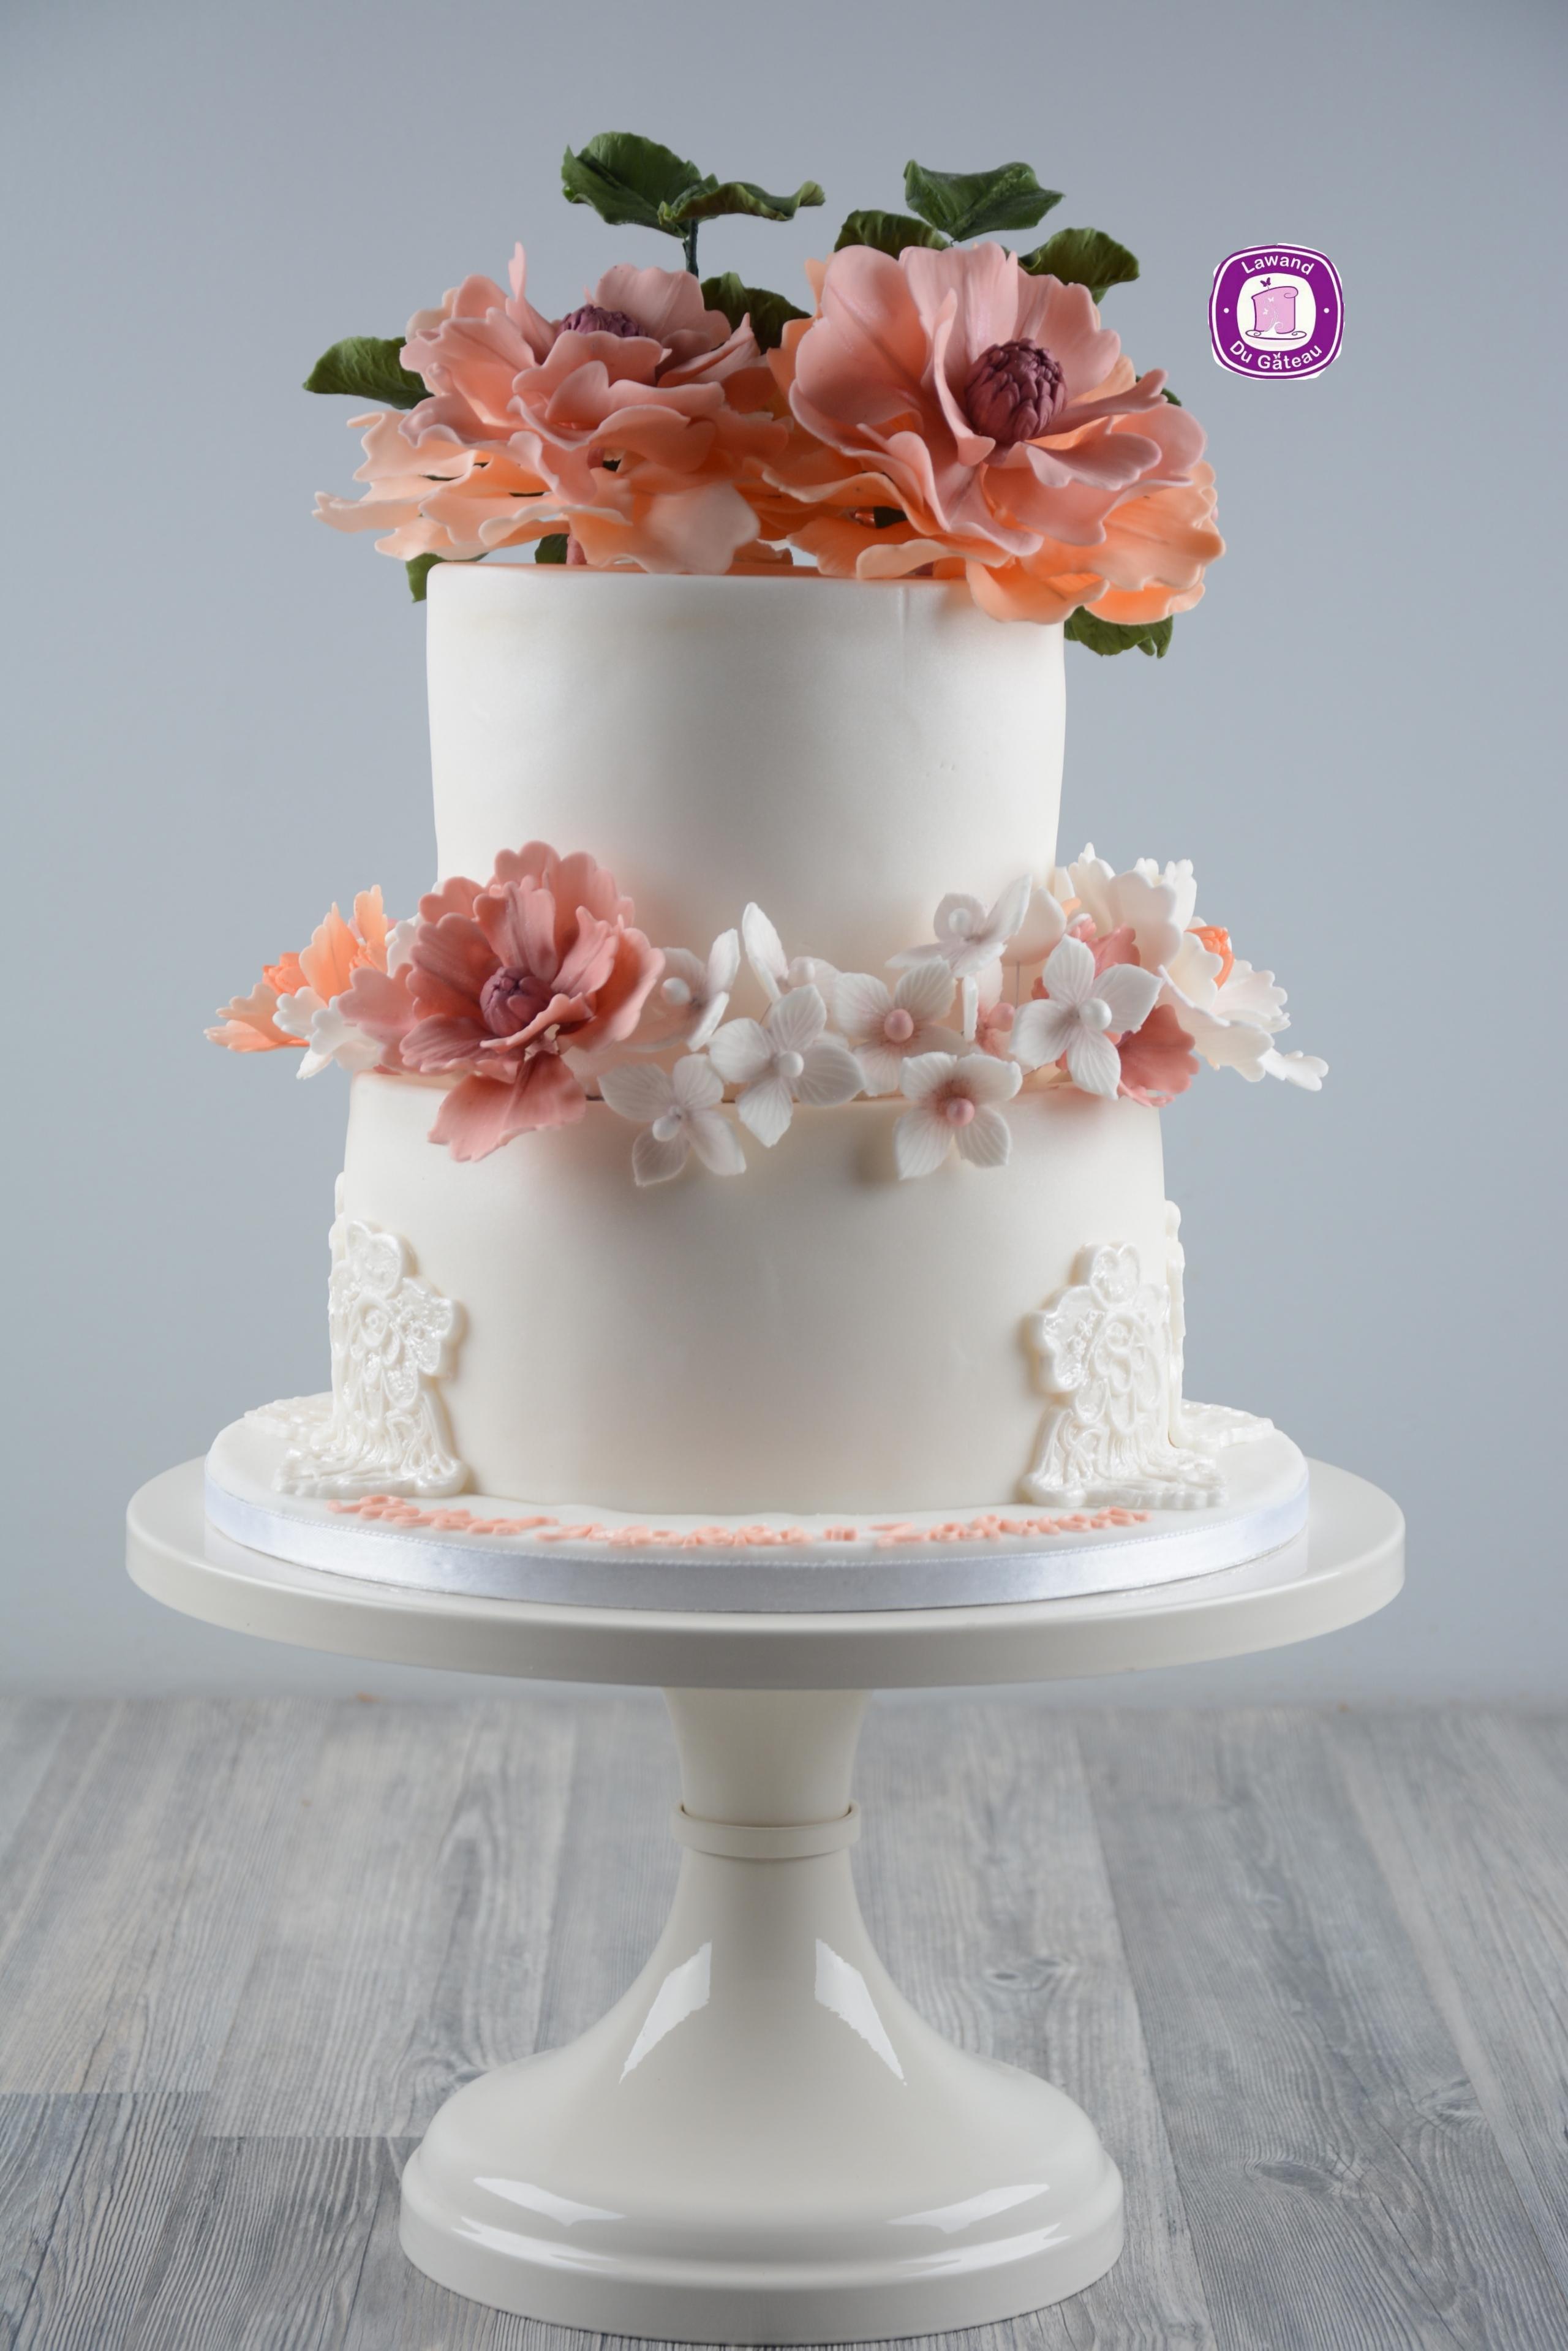 White wedding cake with orange and pink sugar flowers